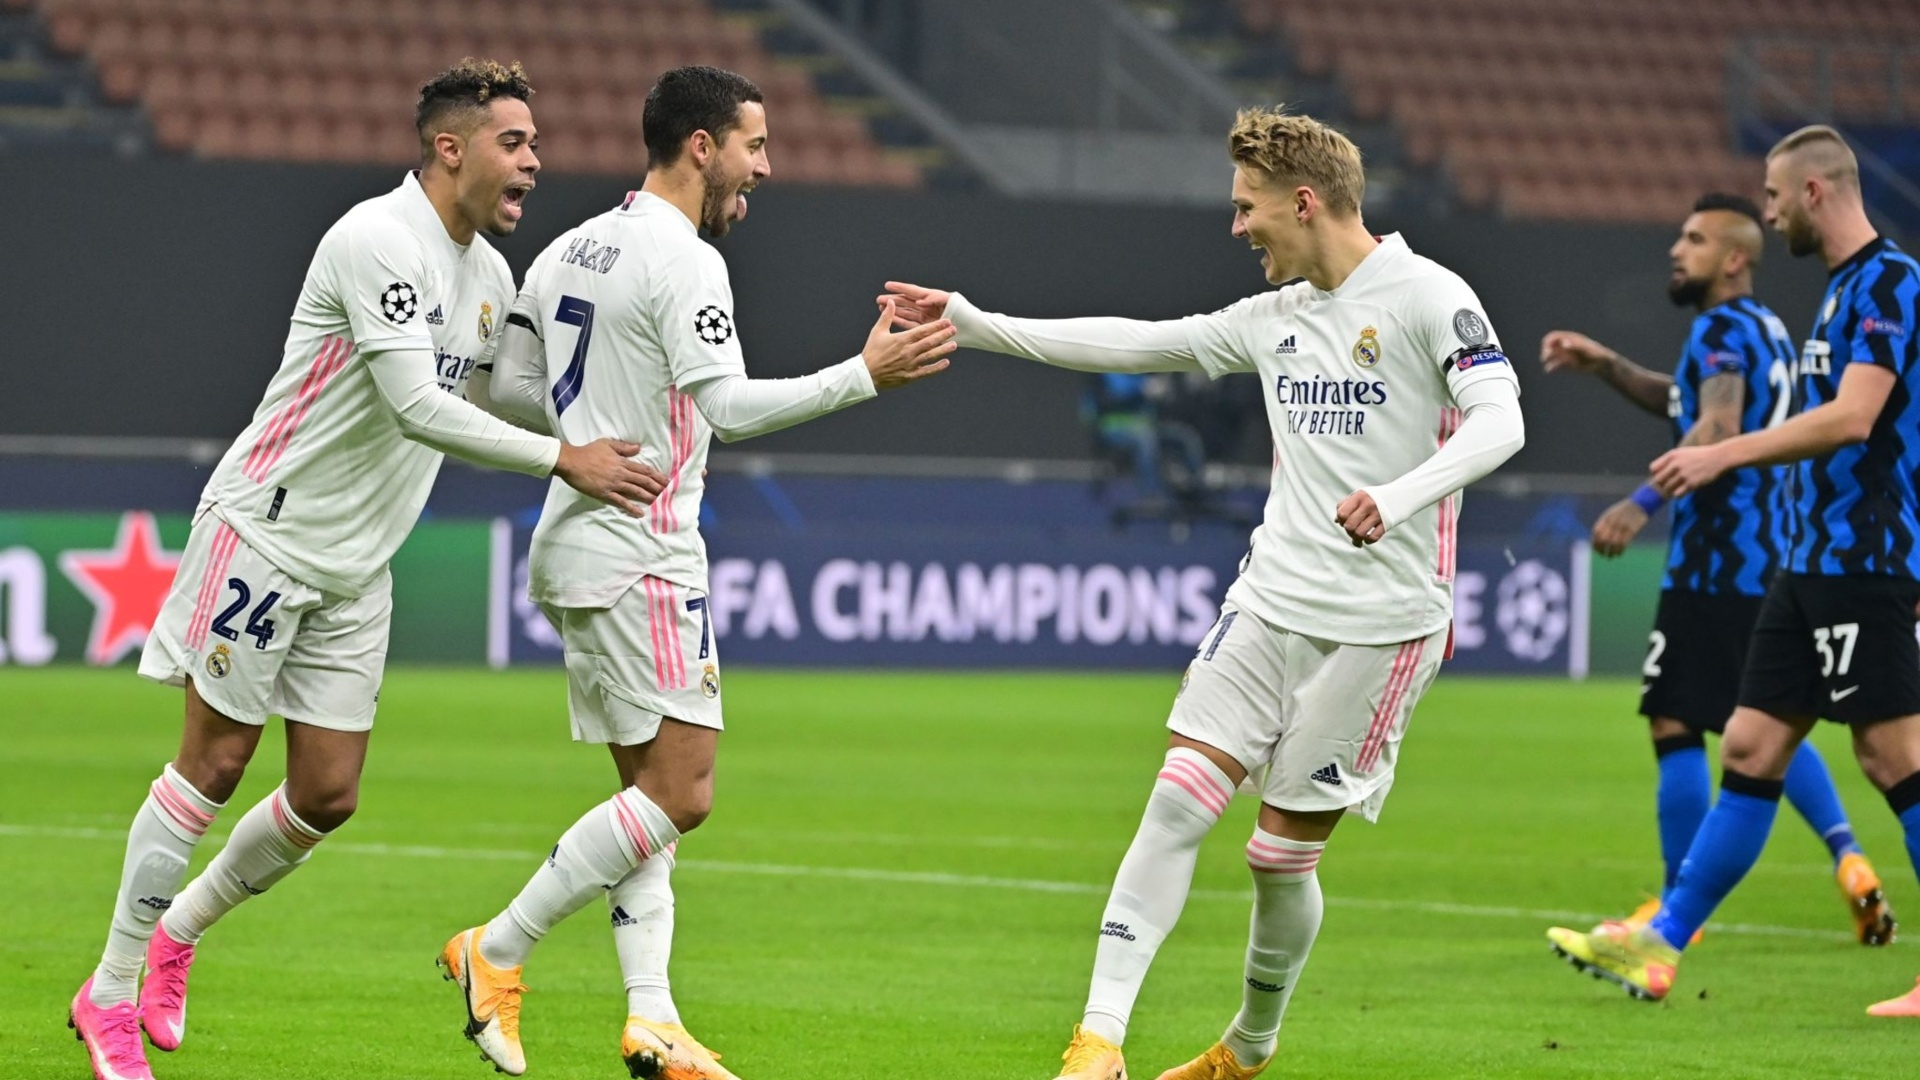 Match report: Inter Milan 0-2 Real Madrid